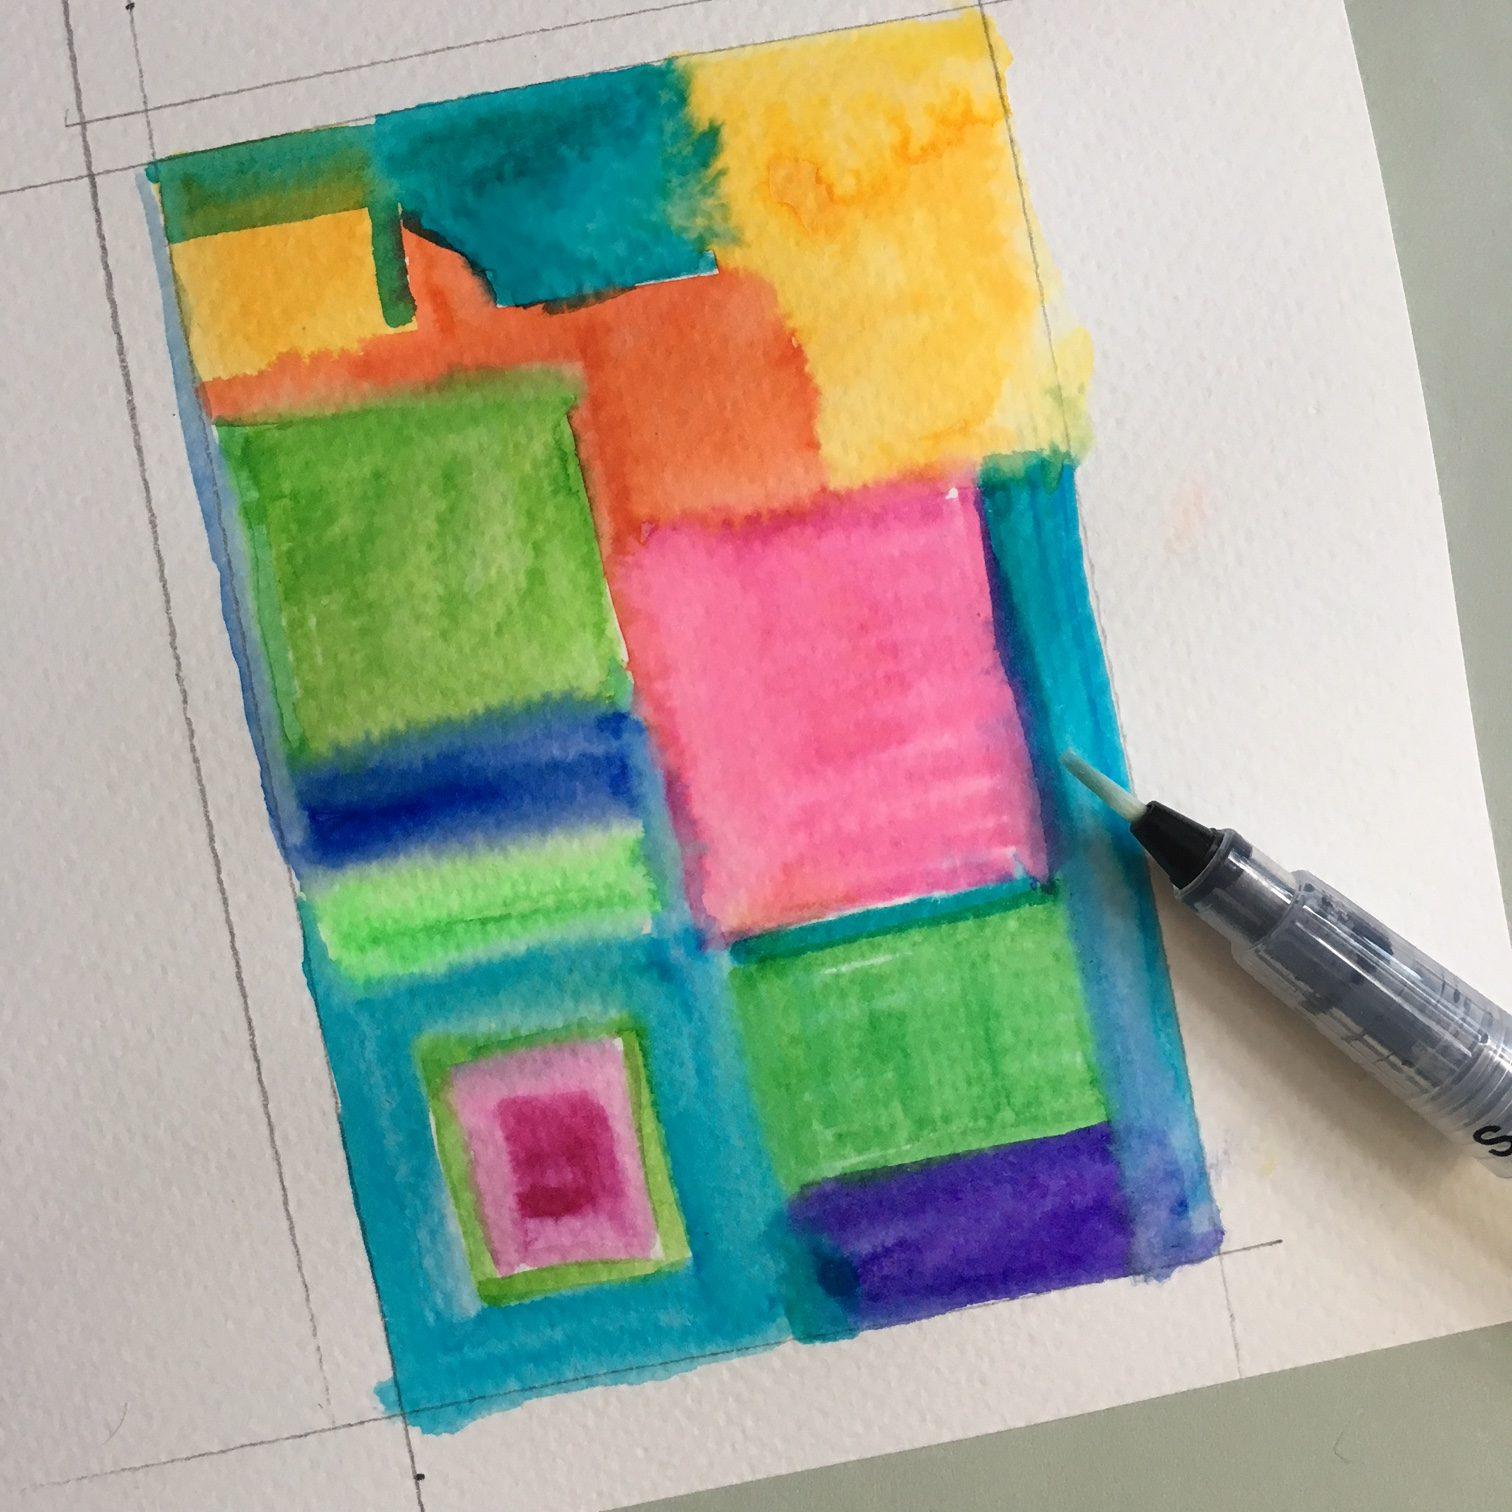 watercolouring the marker strokes